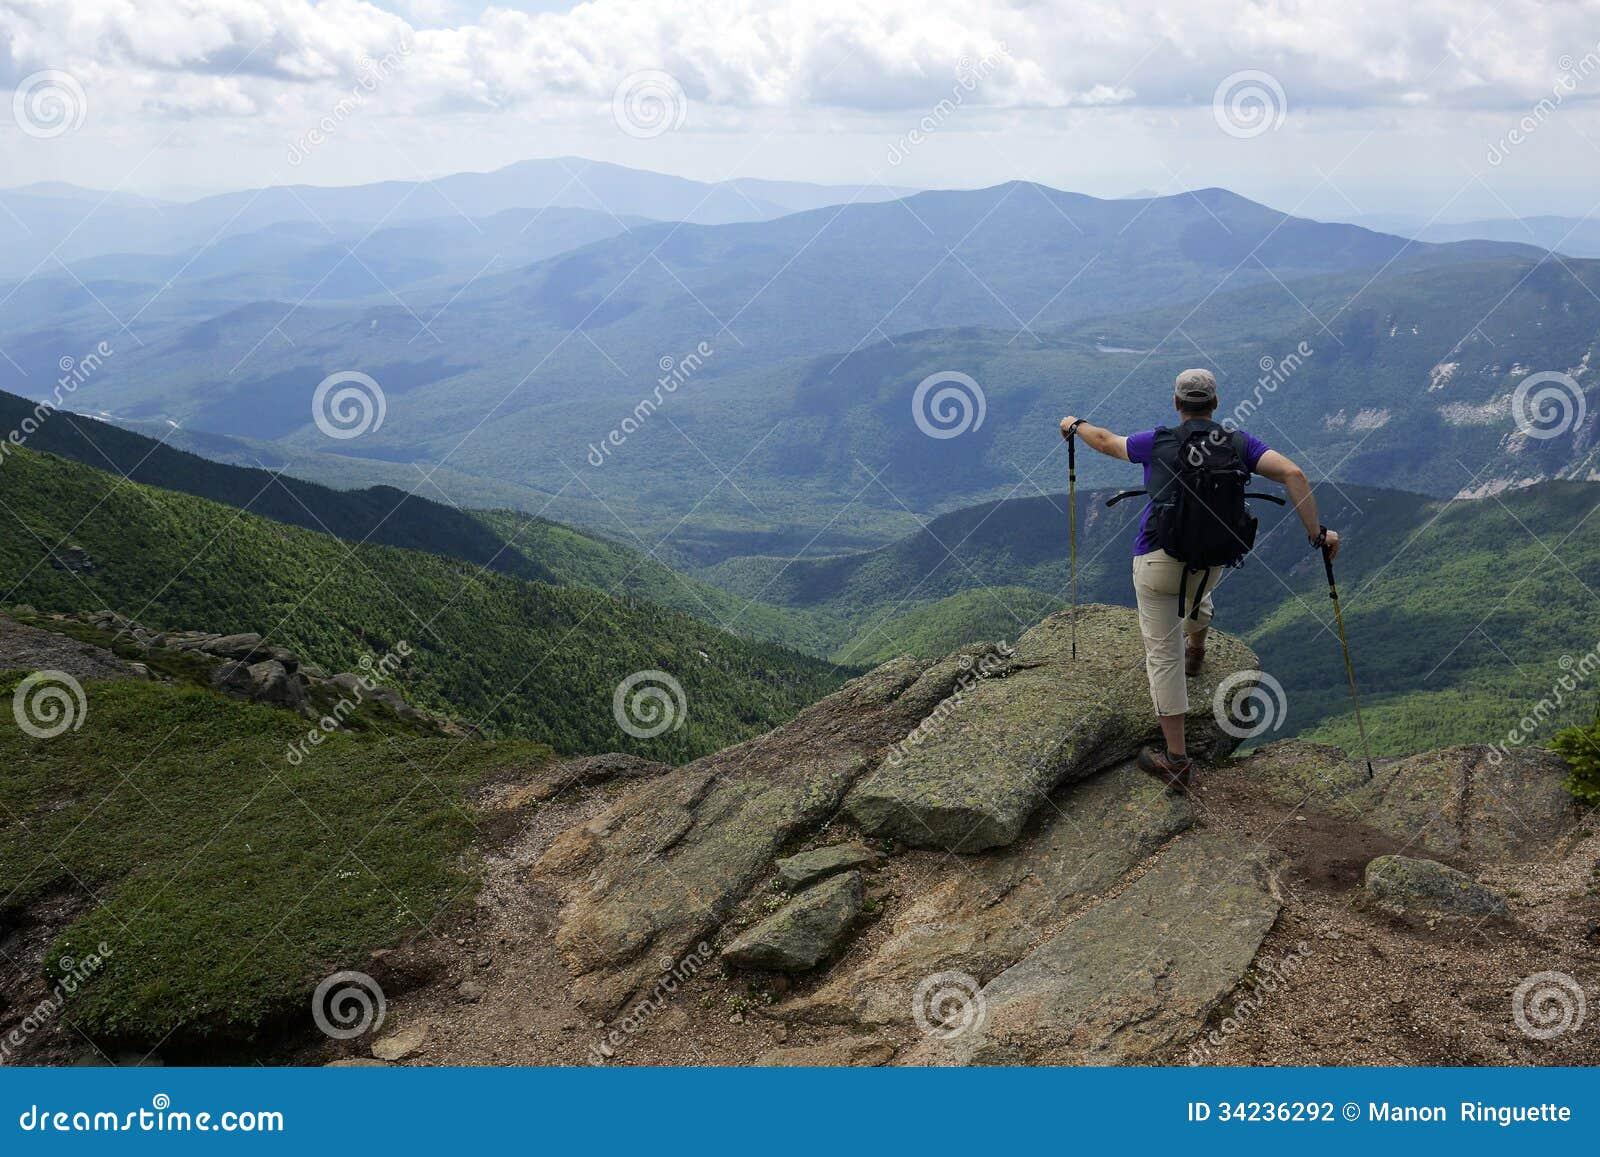 Mount Lafayette White Mountains New Hampshire Stock